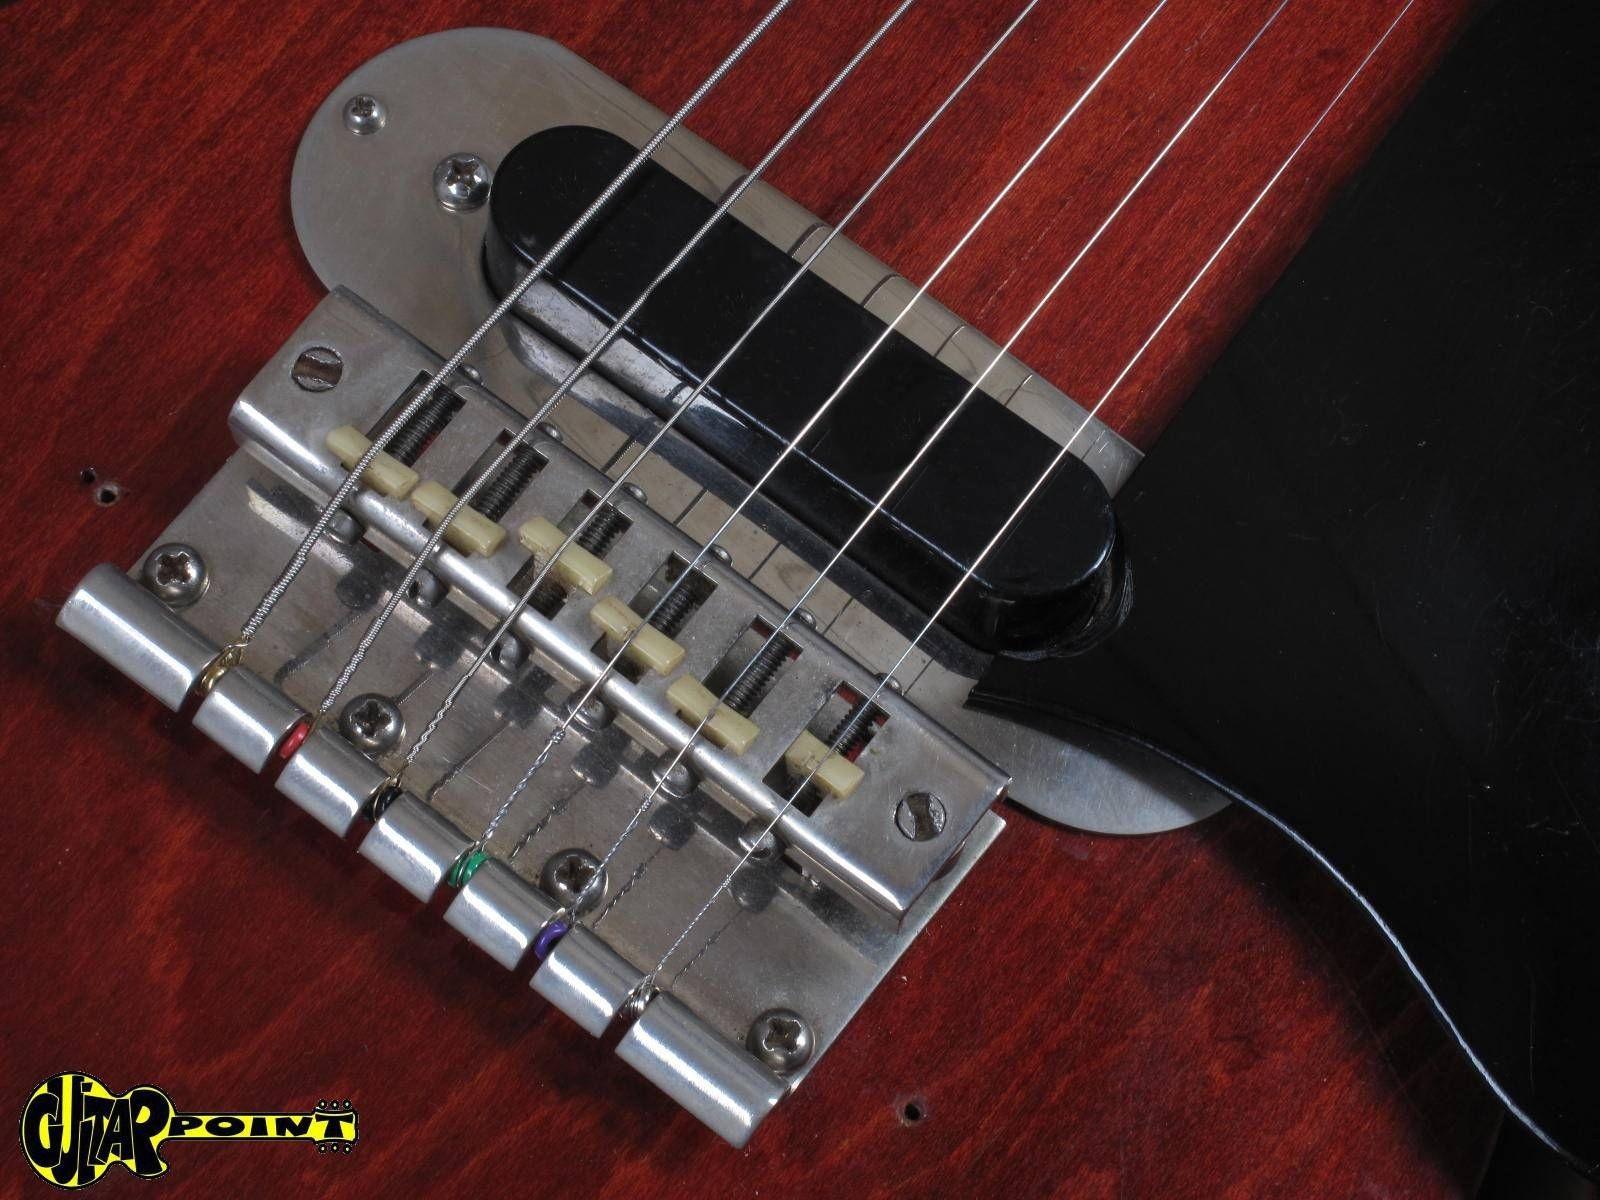 Acoustic Electric Guitar Parts Diagram 1971 Gibson Es 320 Td Cherry Electricguitardiagramjpg Geeitahs Pinterest Of